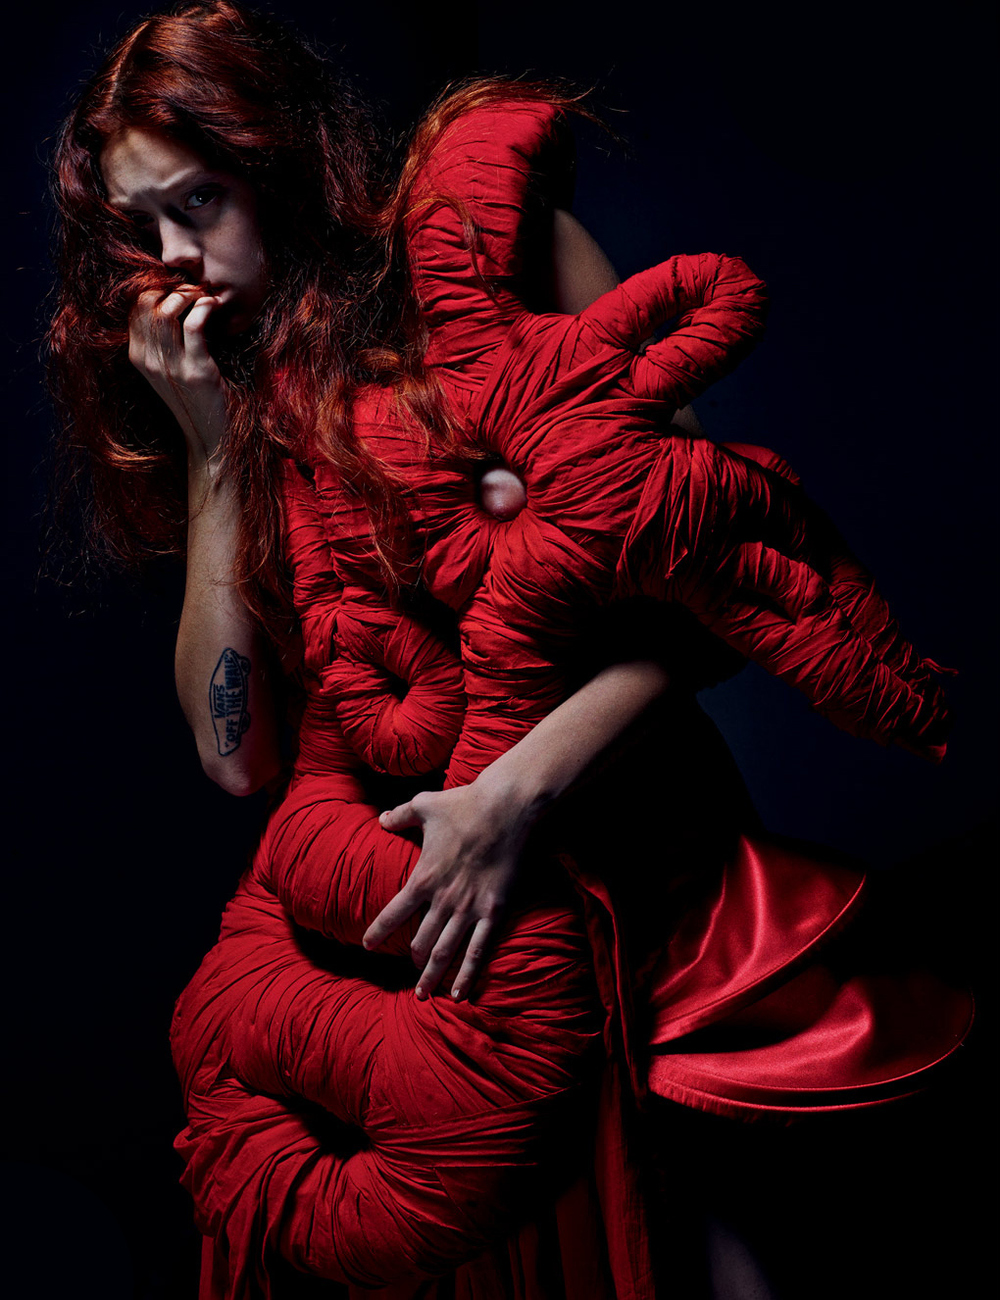 natalie-westling-grace-hartzel-roos-abels-sora-choi-by-mario-sorrenti-for-love-magazine-13-spring-summer-2015.jpg